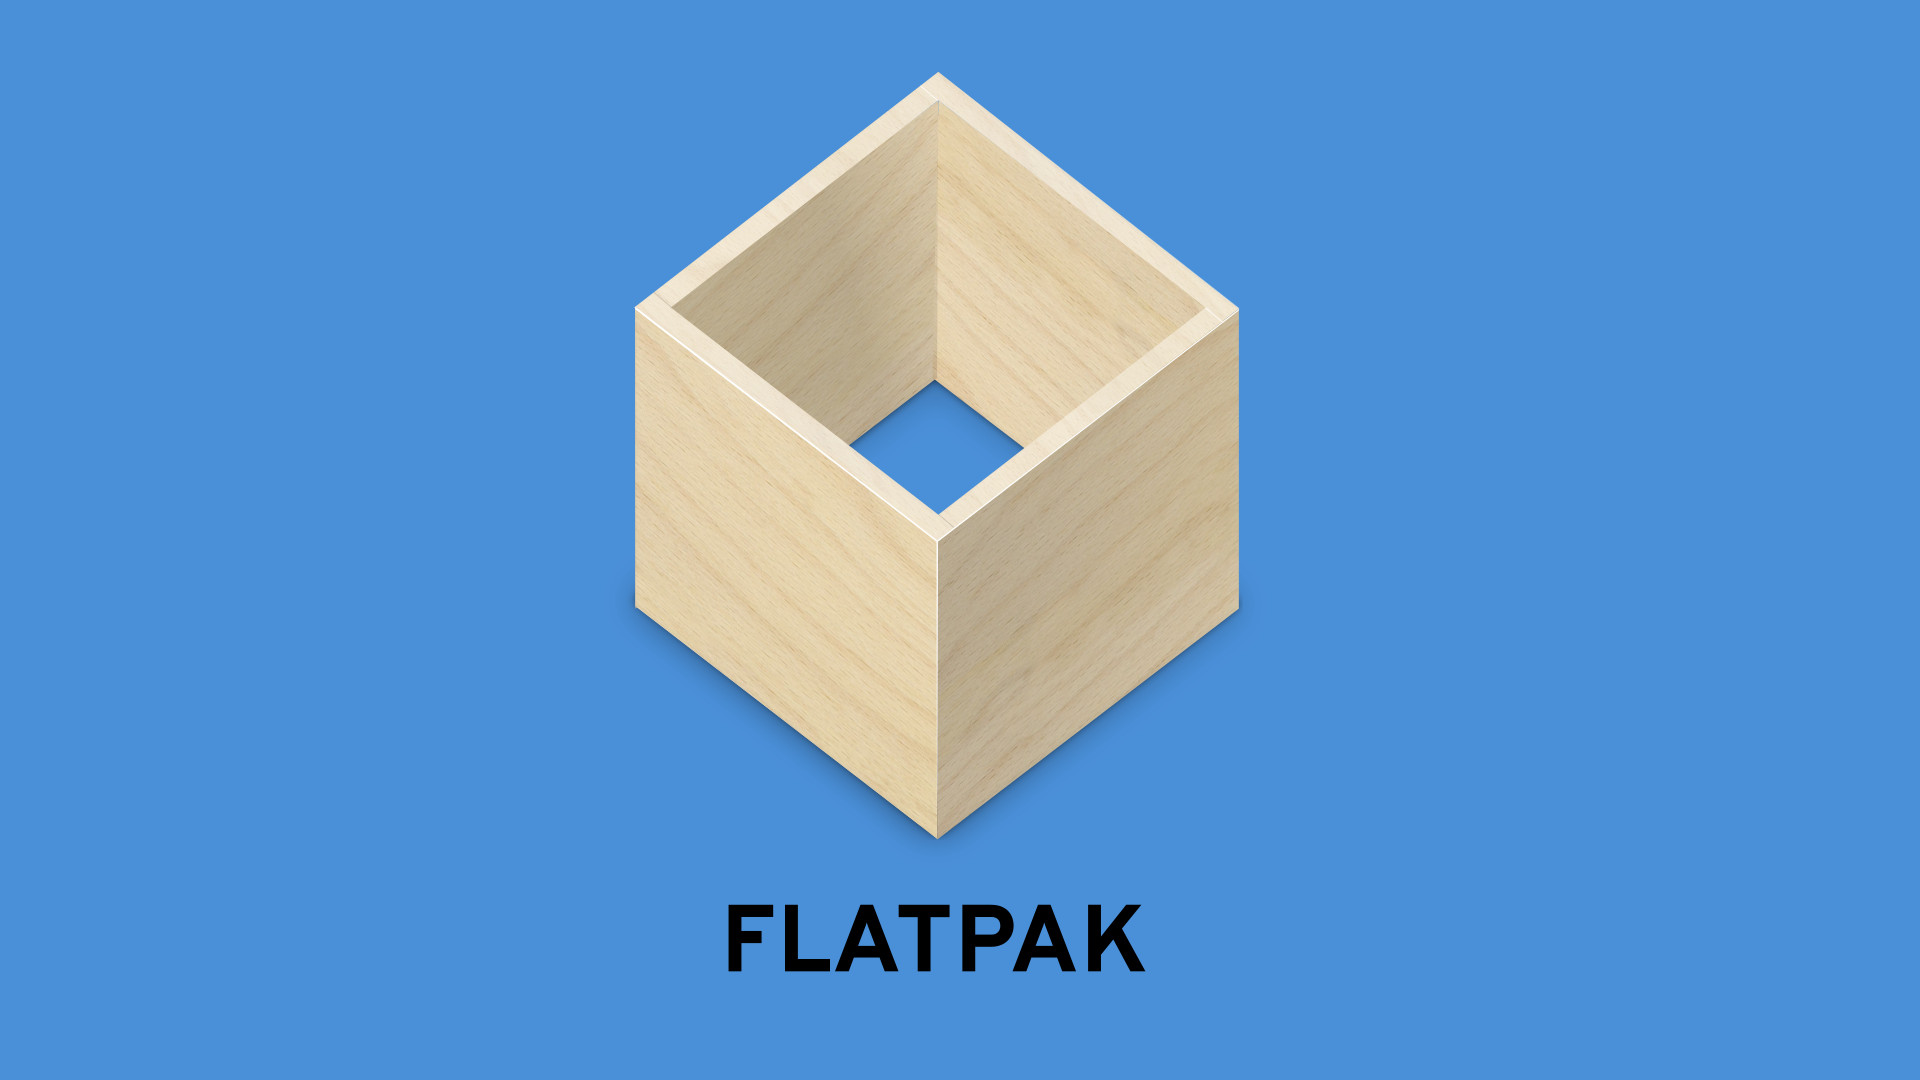 flatpaklogo